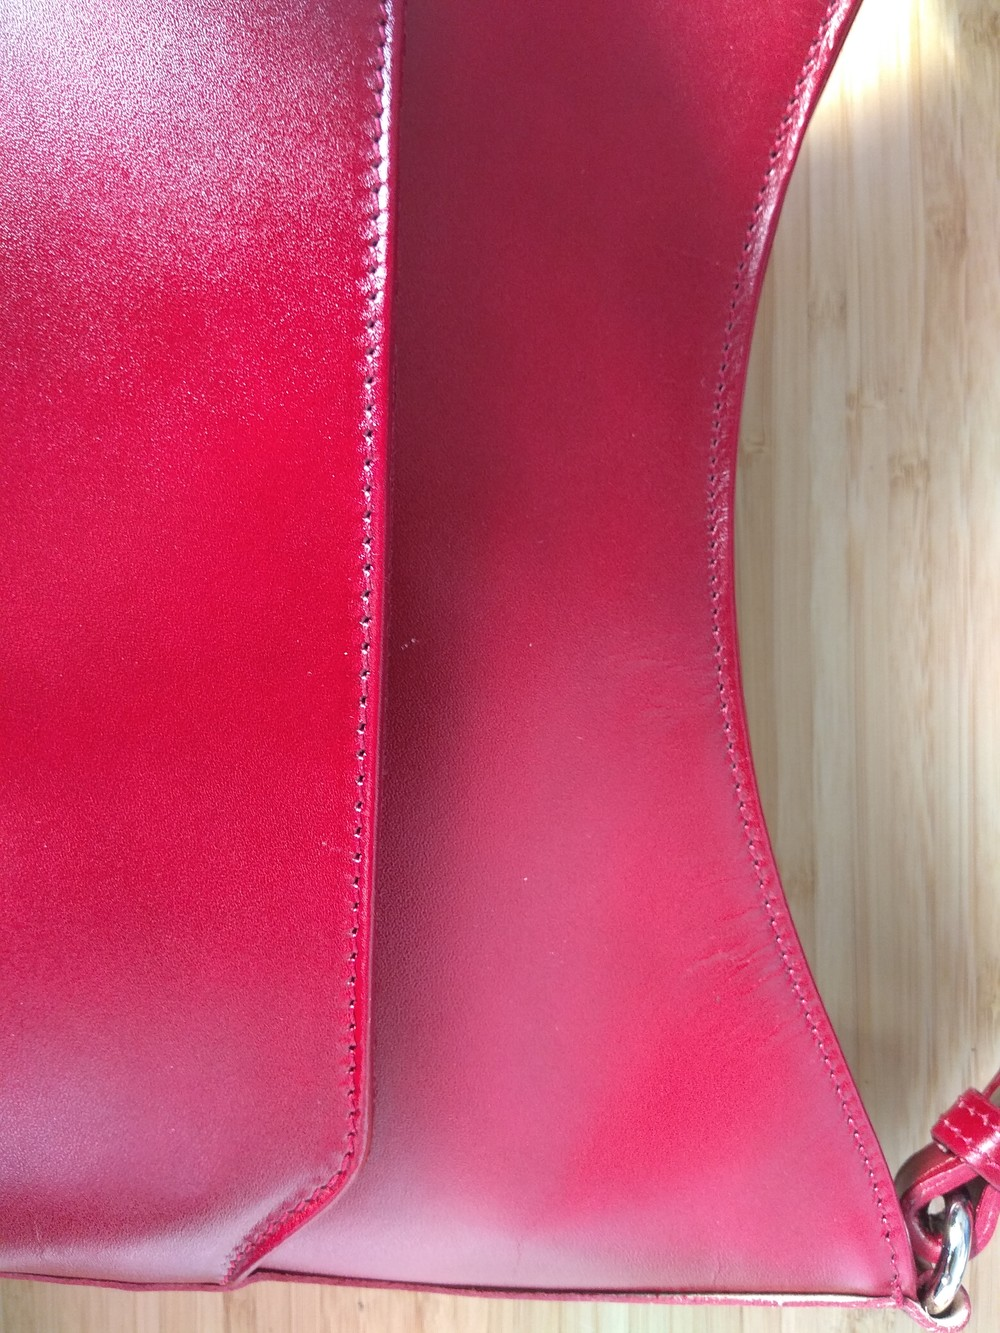 Červená kožená kabelka cez rameno ItalY Lydia - Kabea.cz 48faf8672bf